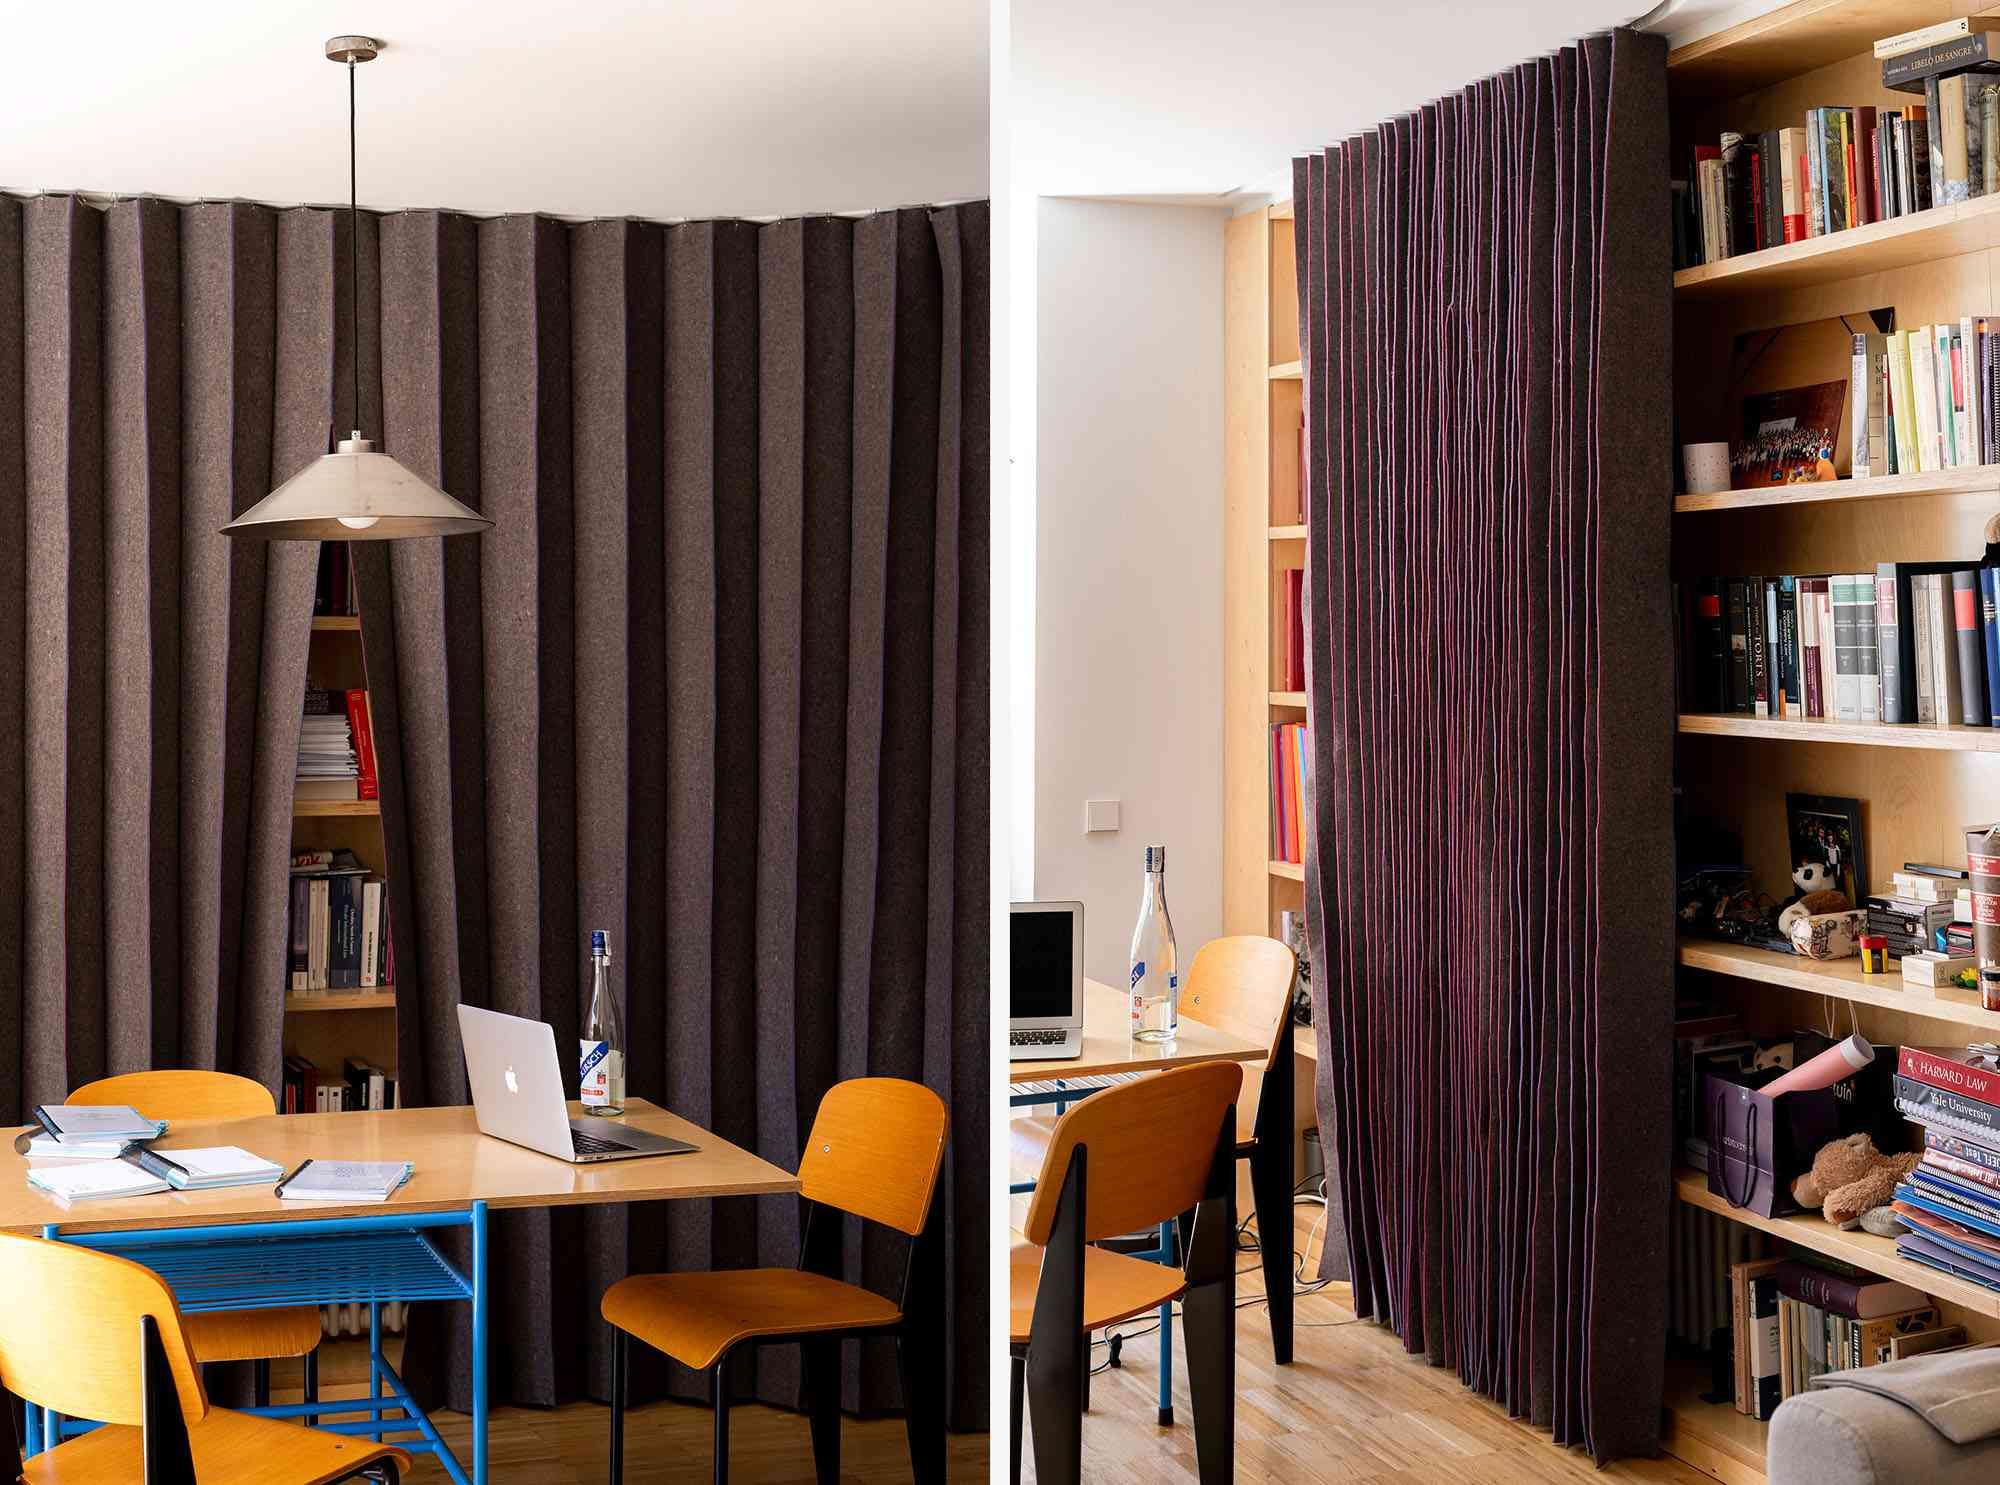 JM55 microapartment renovation by BURR Studio study